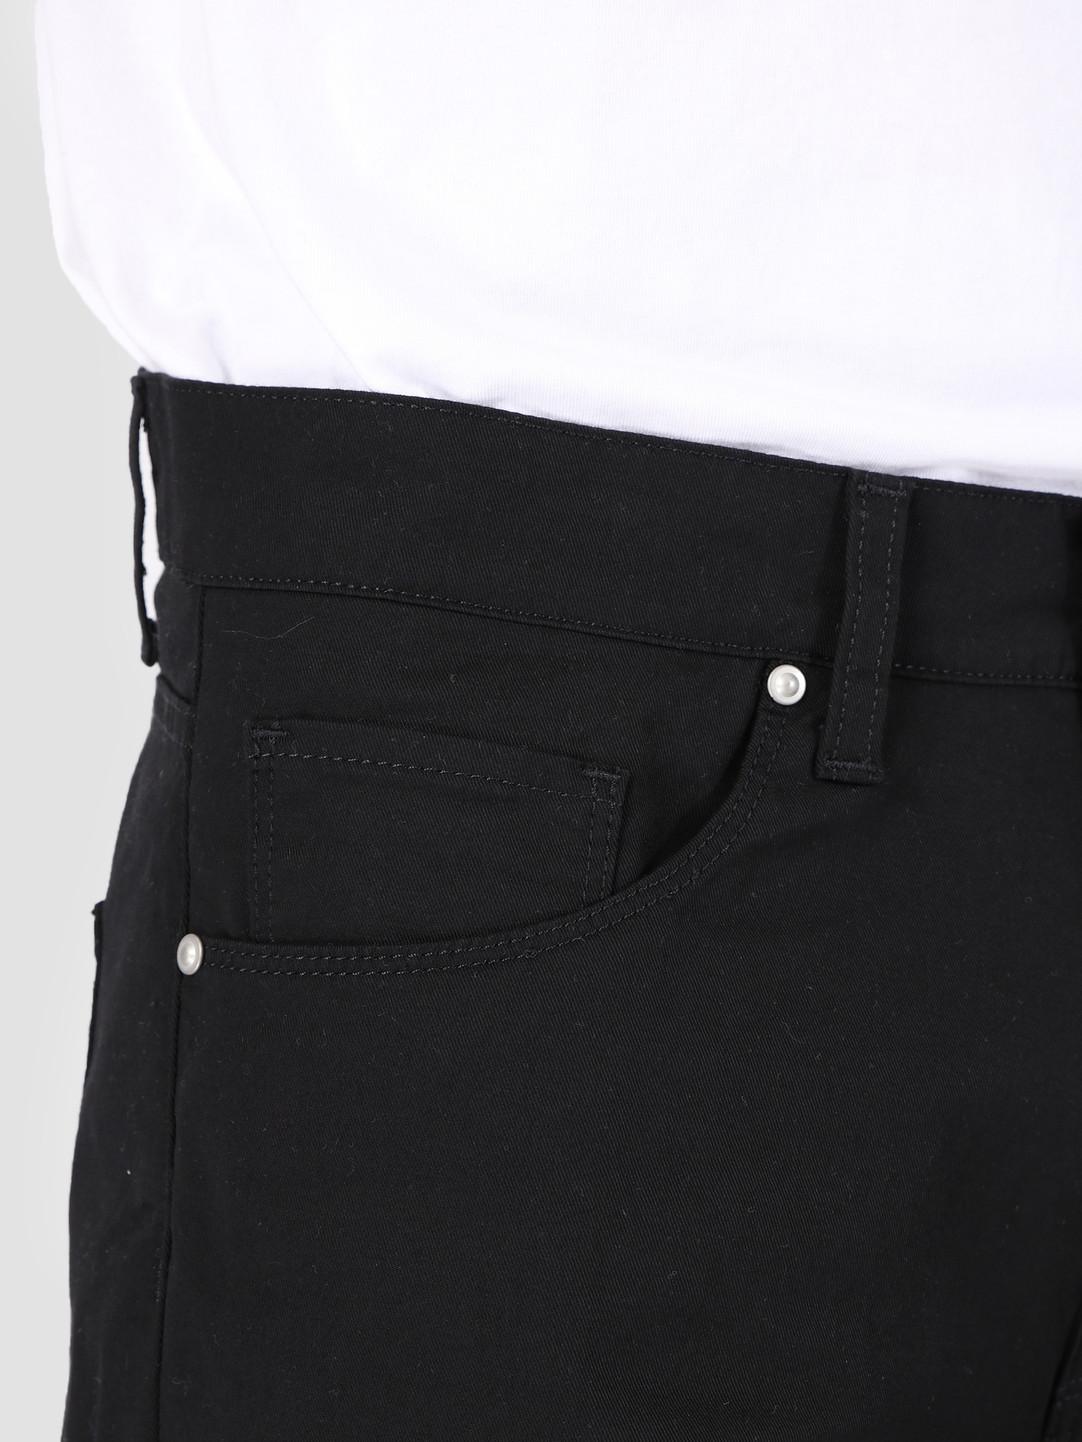 Carhartt WIP Carhartt WIP Swell Short Rinsed Black I012292-8902